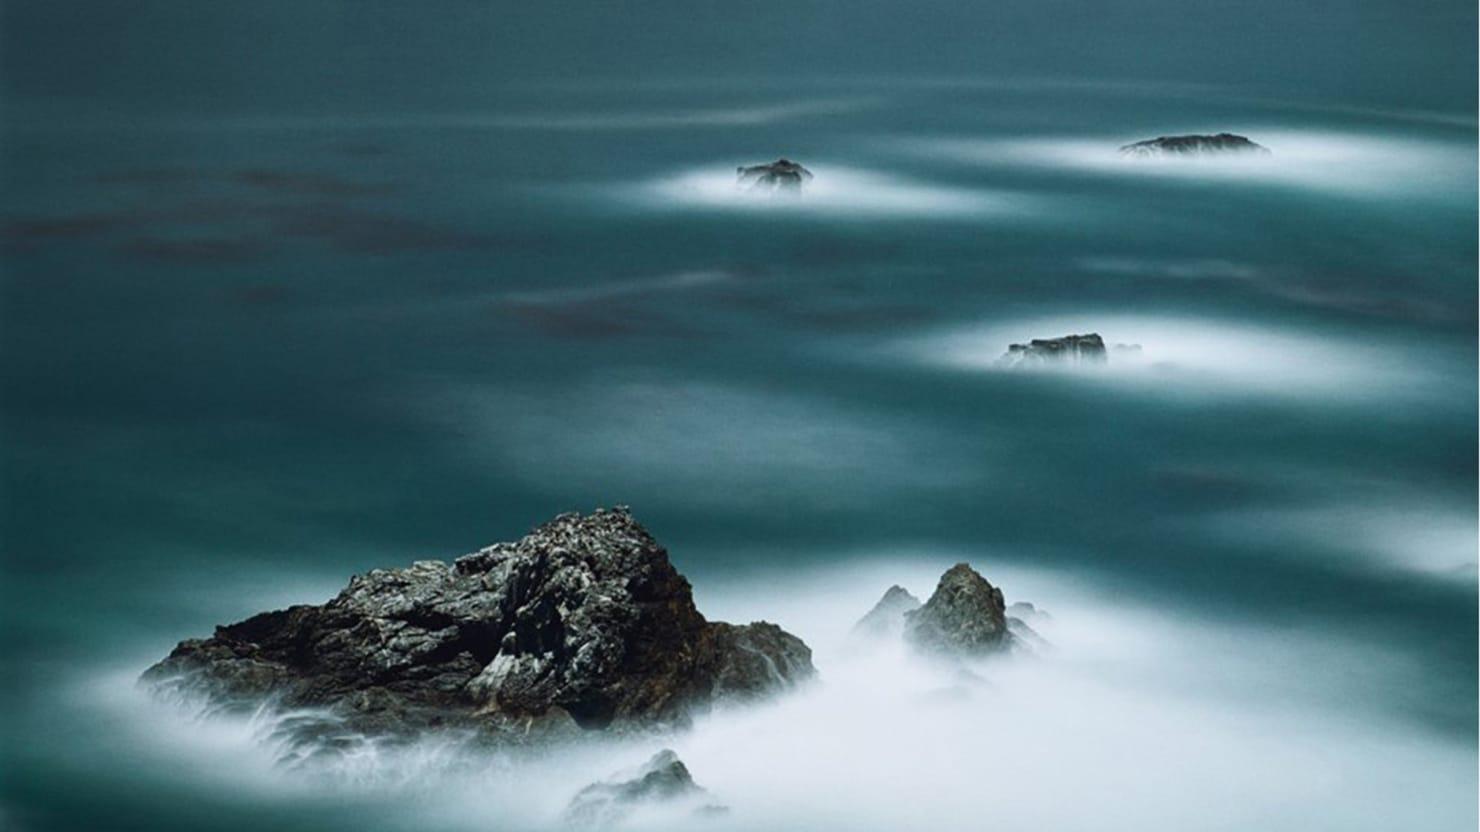 Full Moon: Darren Almond's Nocturnal Nature Series